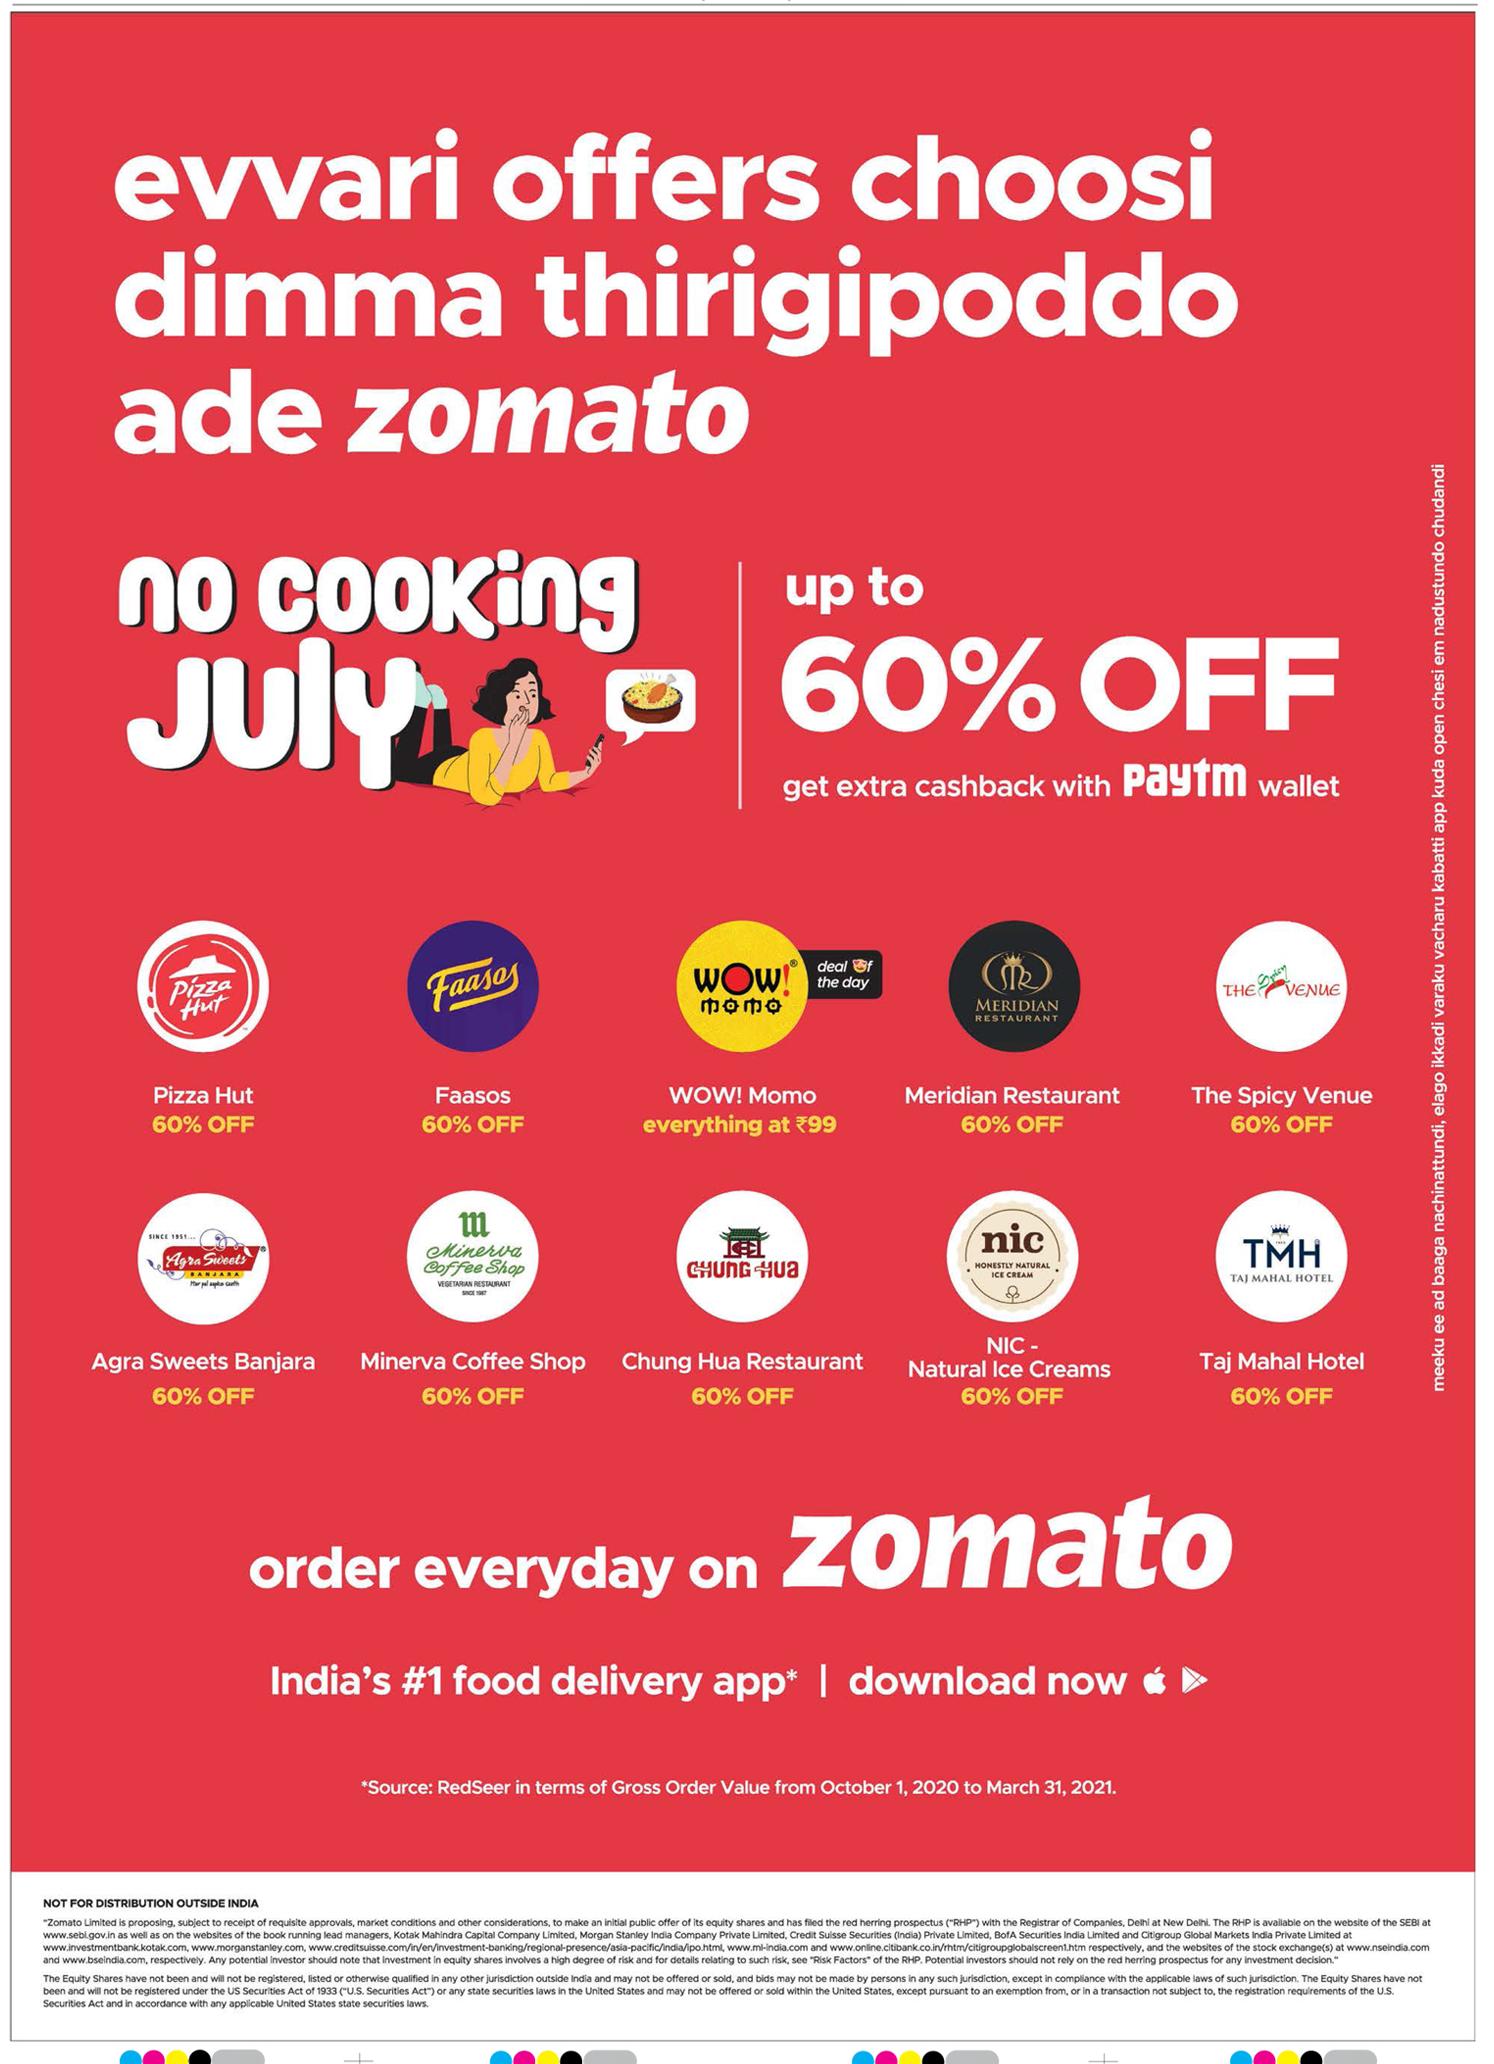 zomato-no-cooking-july-evvari-offers-choosi-dimma-thirigipoddo-ade-zomato-up-to-60&-off-ad-deccan-chronicle-11-7-2021